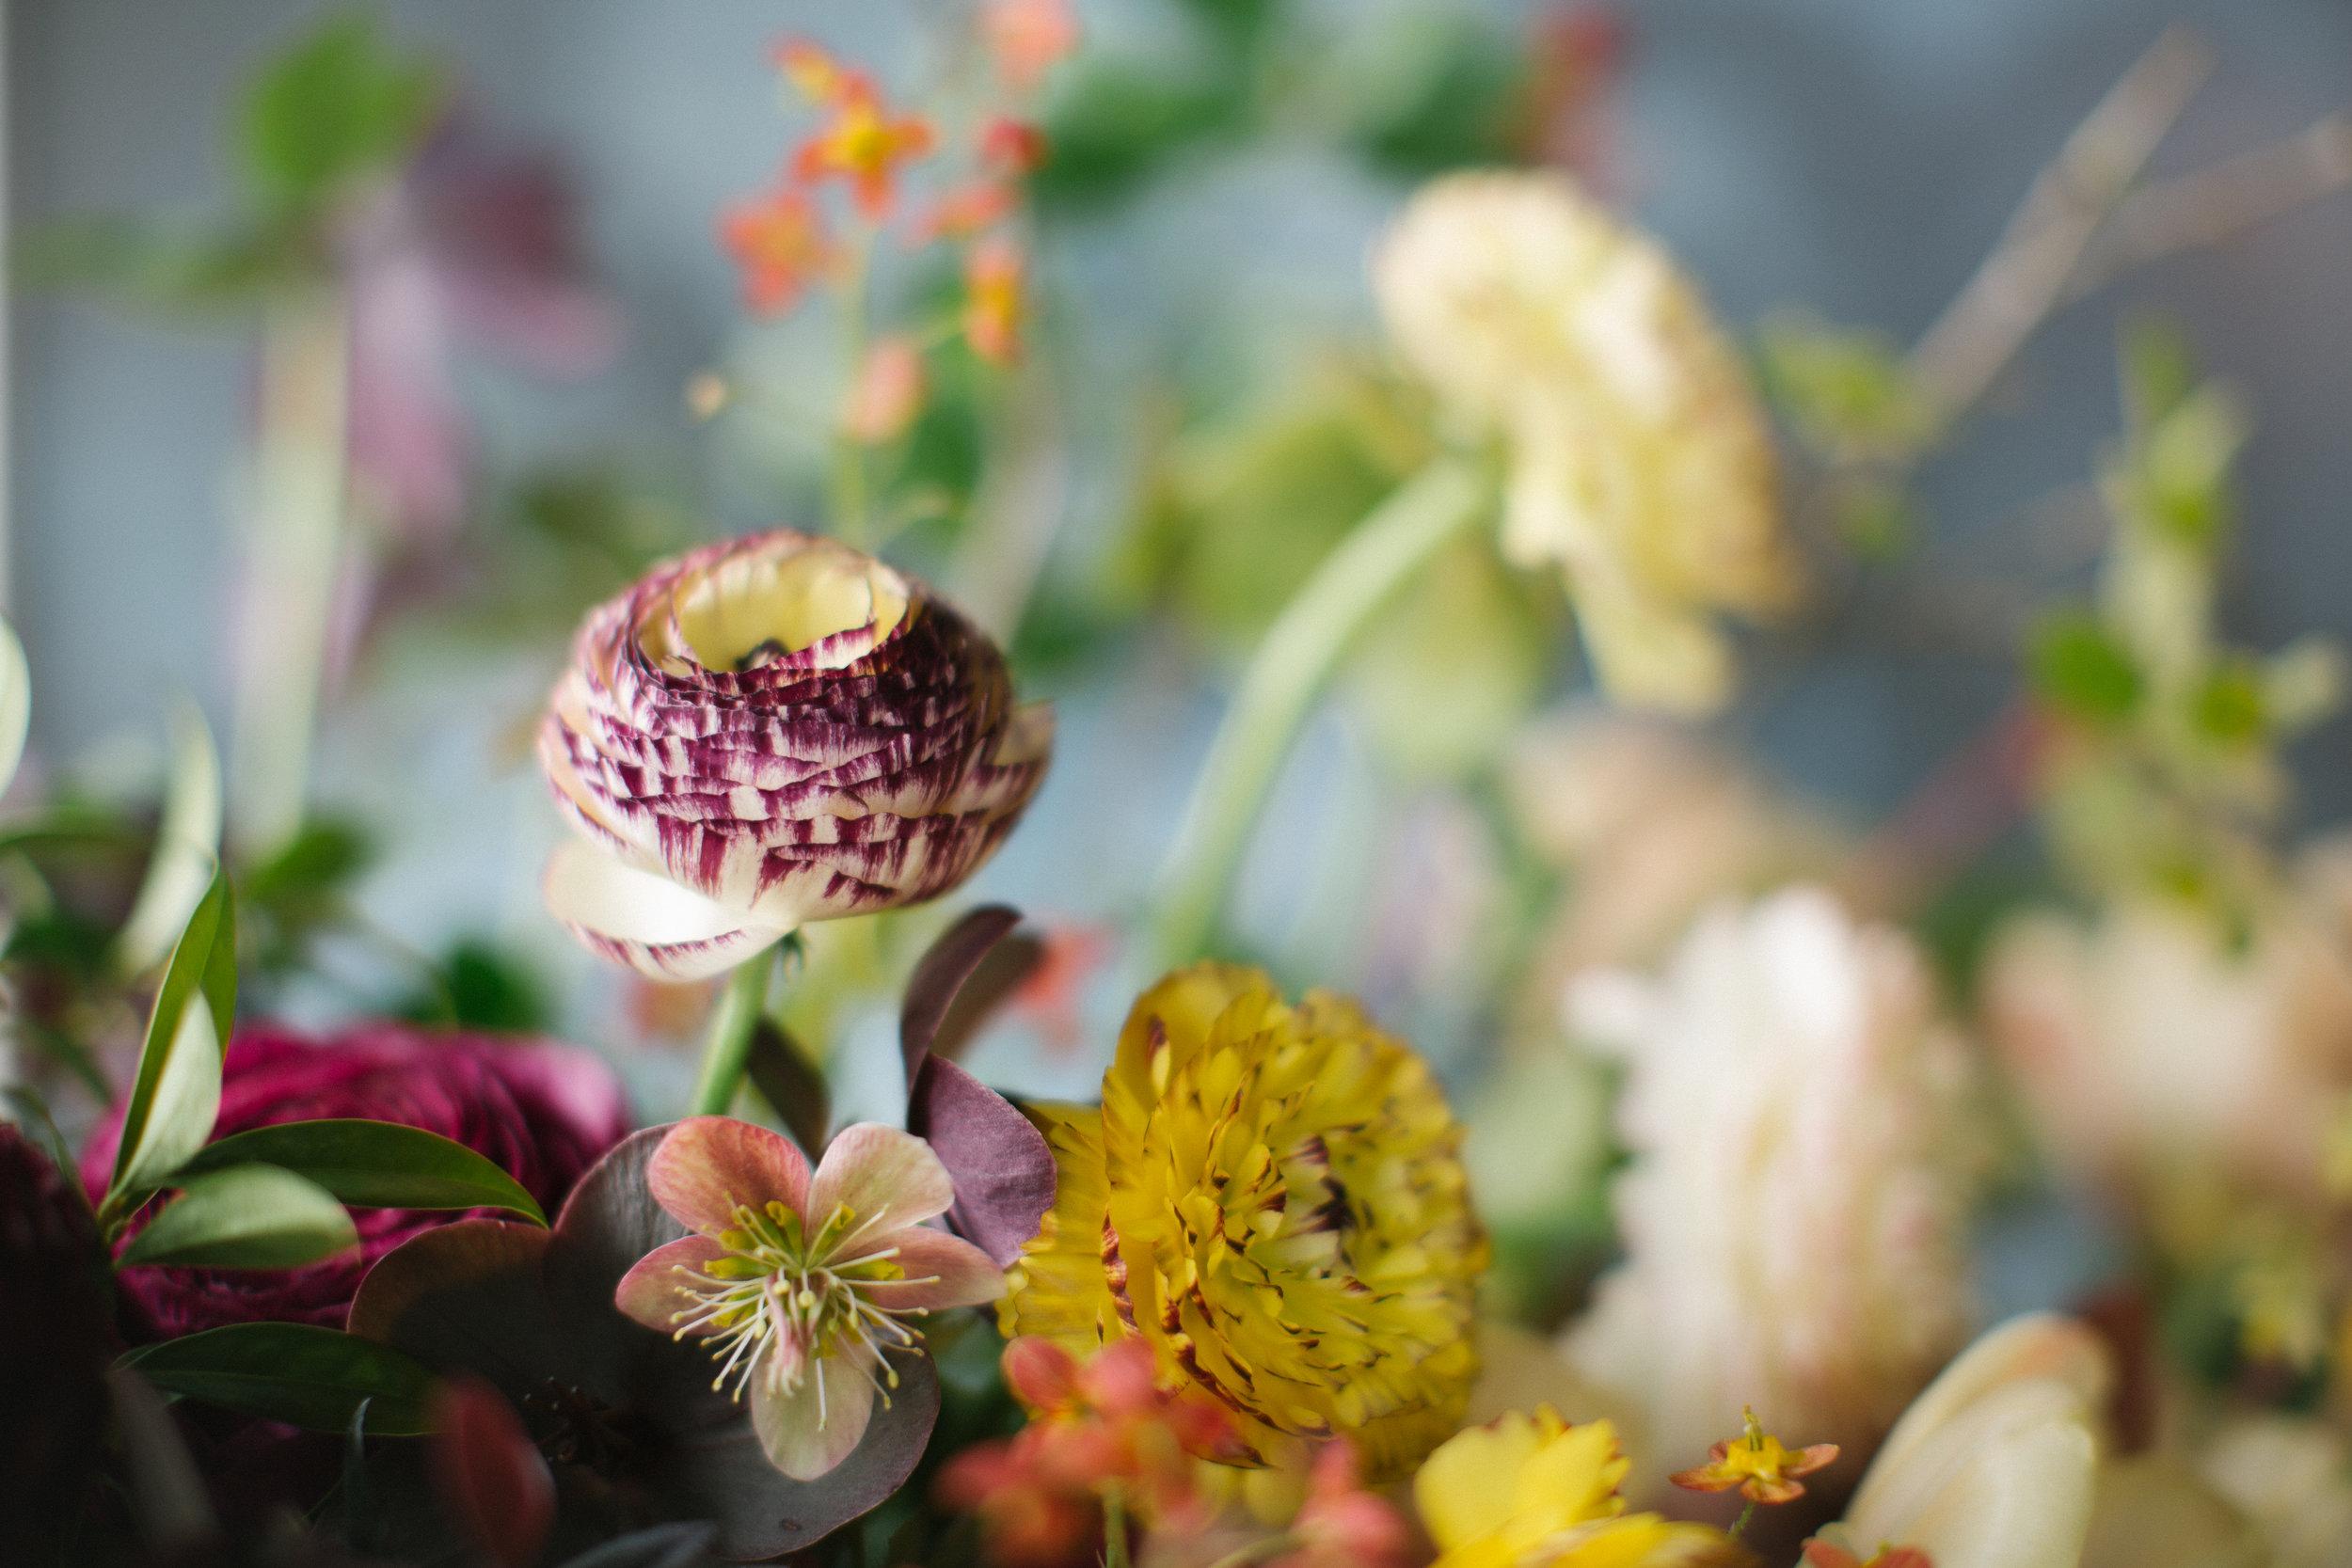 Picotee Ranunculus and a teeny Hellebore blossom